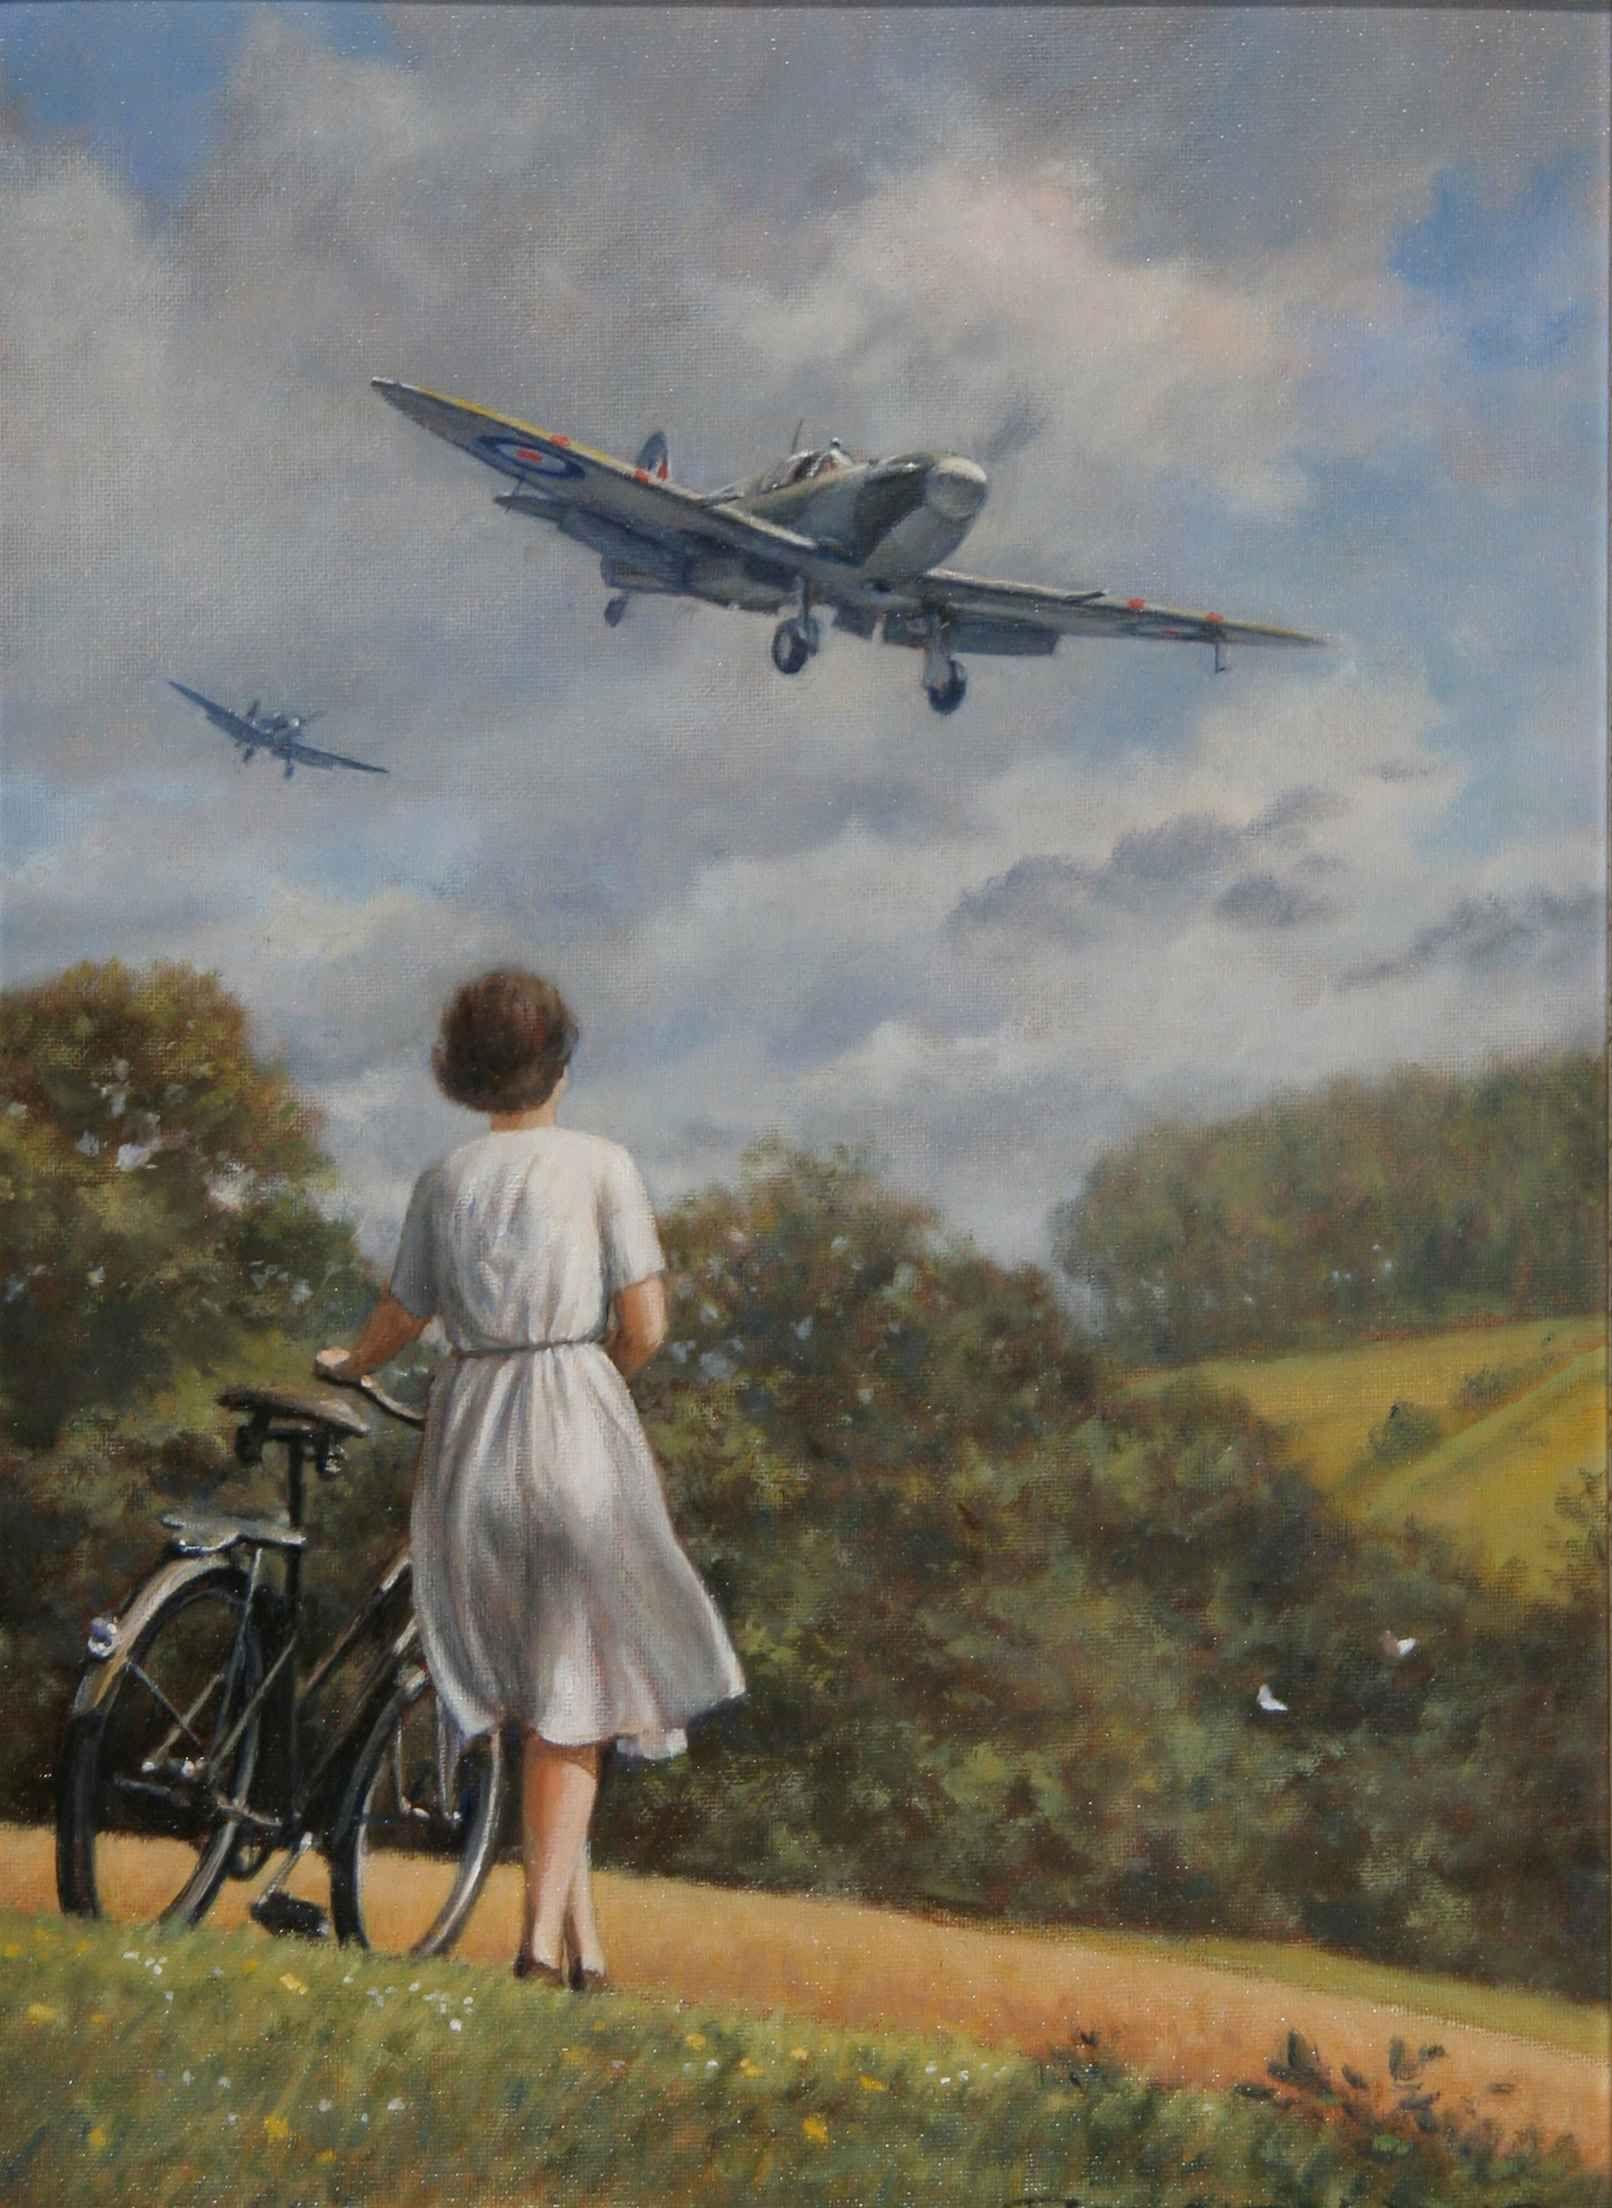 Обои war, painting, aviation, ww2, aircraft, air combat, P 47 thunderbolt, drawing, dogfight. Авиация foto 18